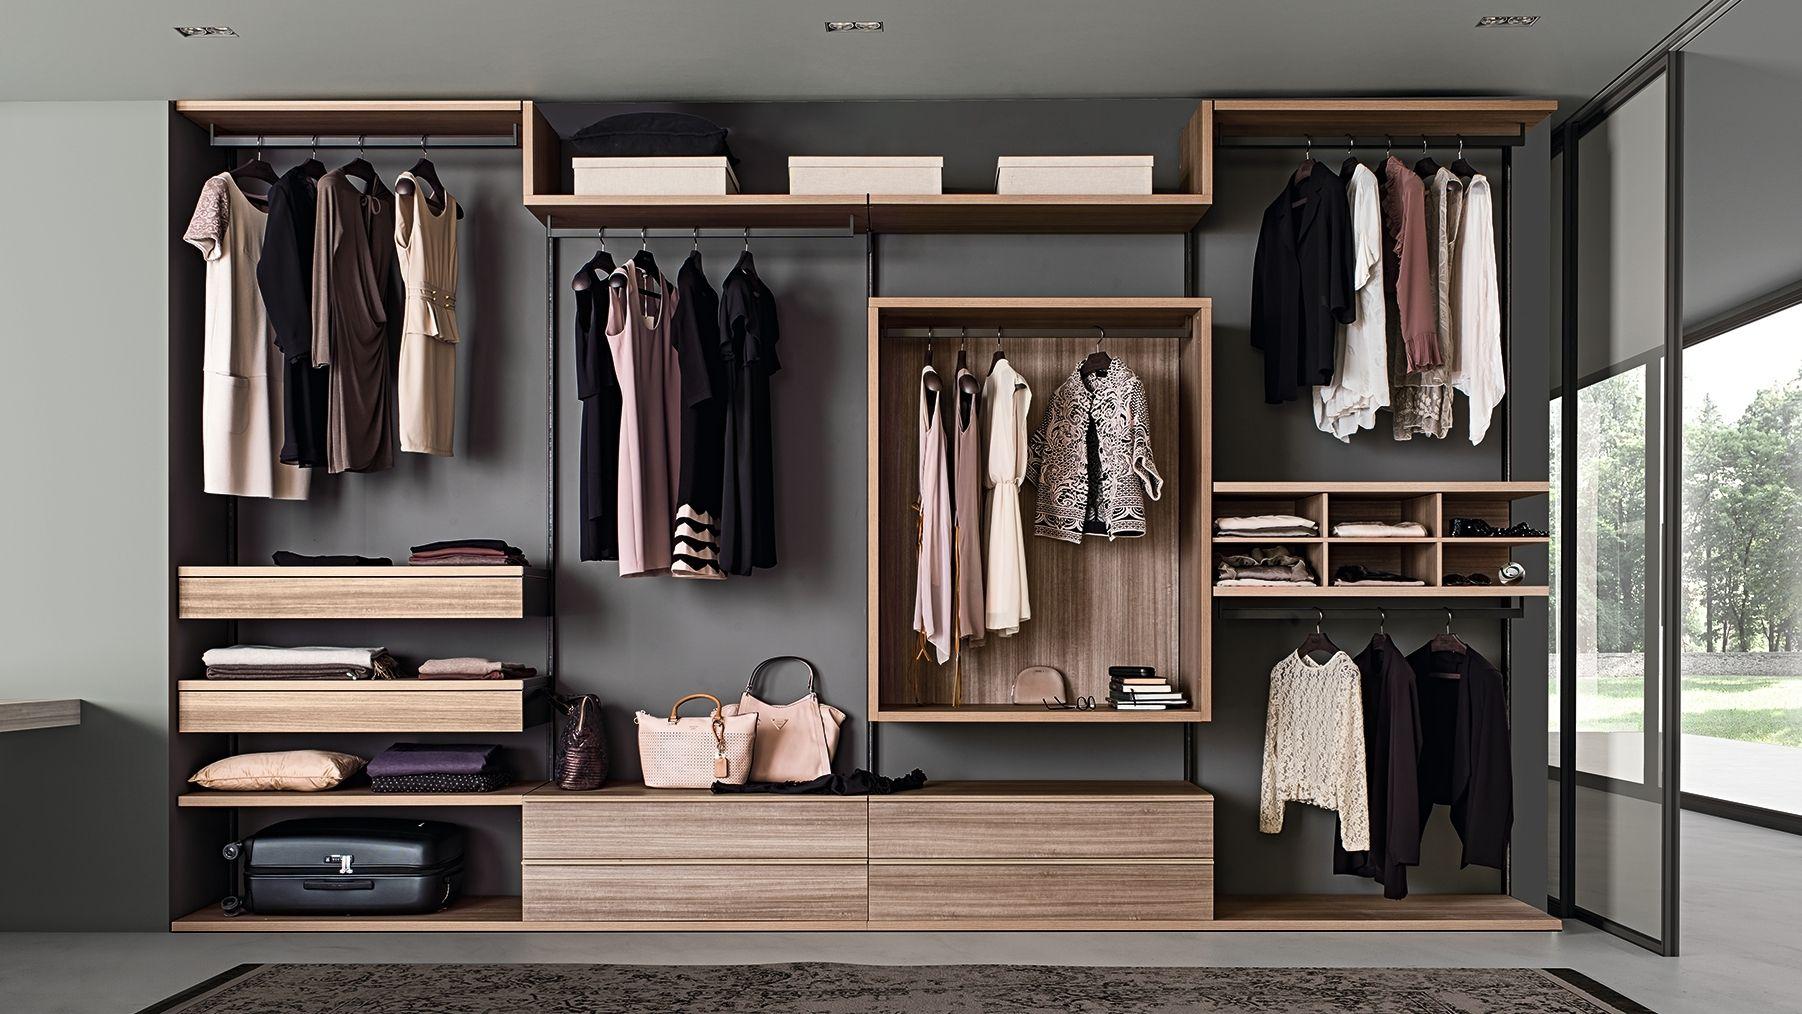 Cabina Armadio Walk In Closets : Pin by michelle kubagawa on móveis